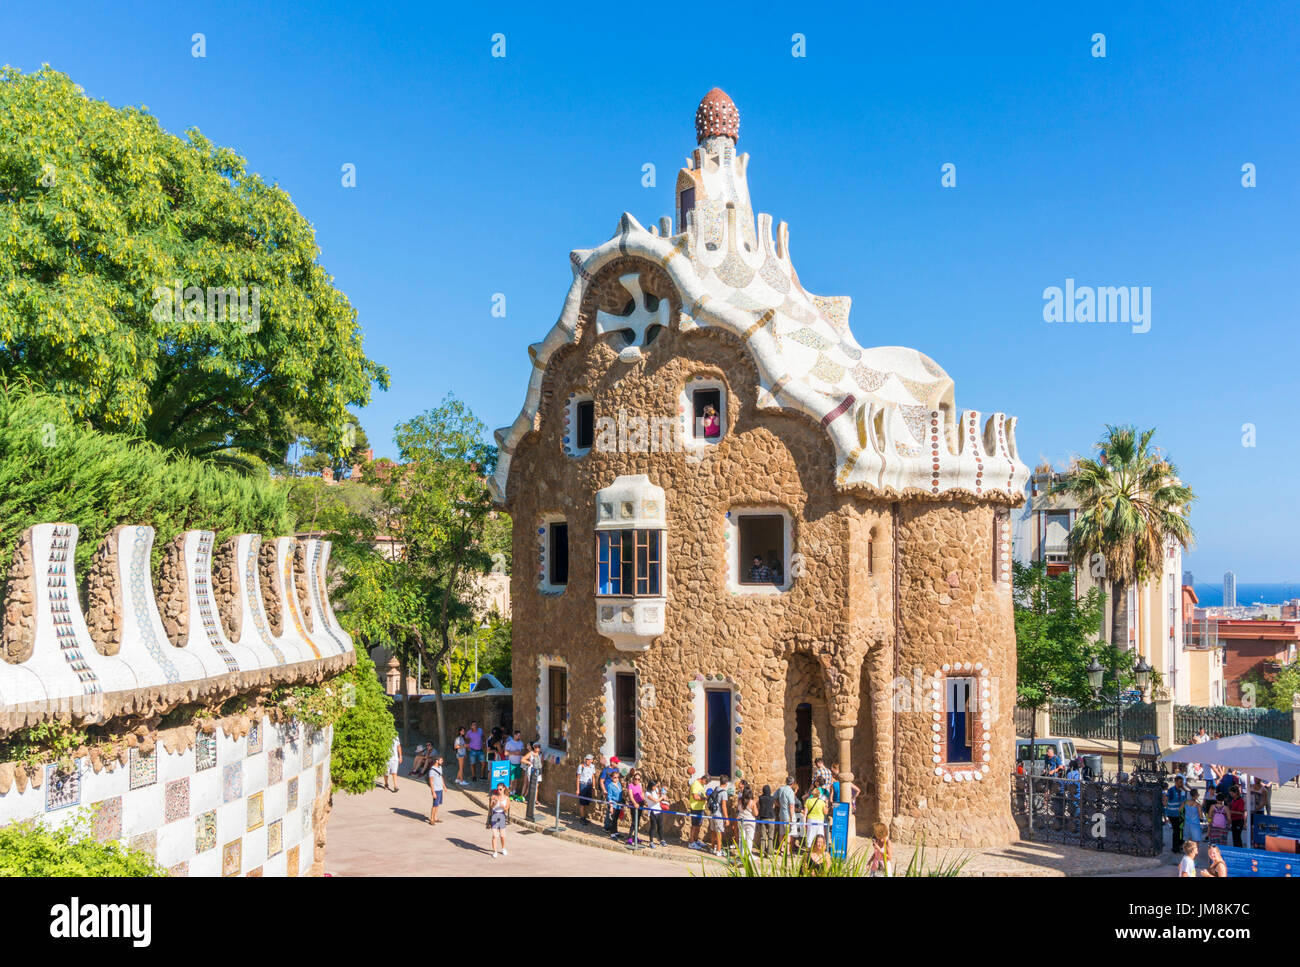 Barcelona-Catalunya Park Güell Barcelona Parc Güell Barcelona Eingang Träger lodge Casa del Guarda Touristen Barcelona Spanien Eu Europa Katalonien Stockbild